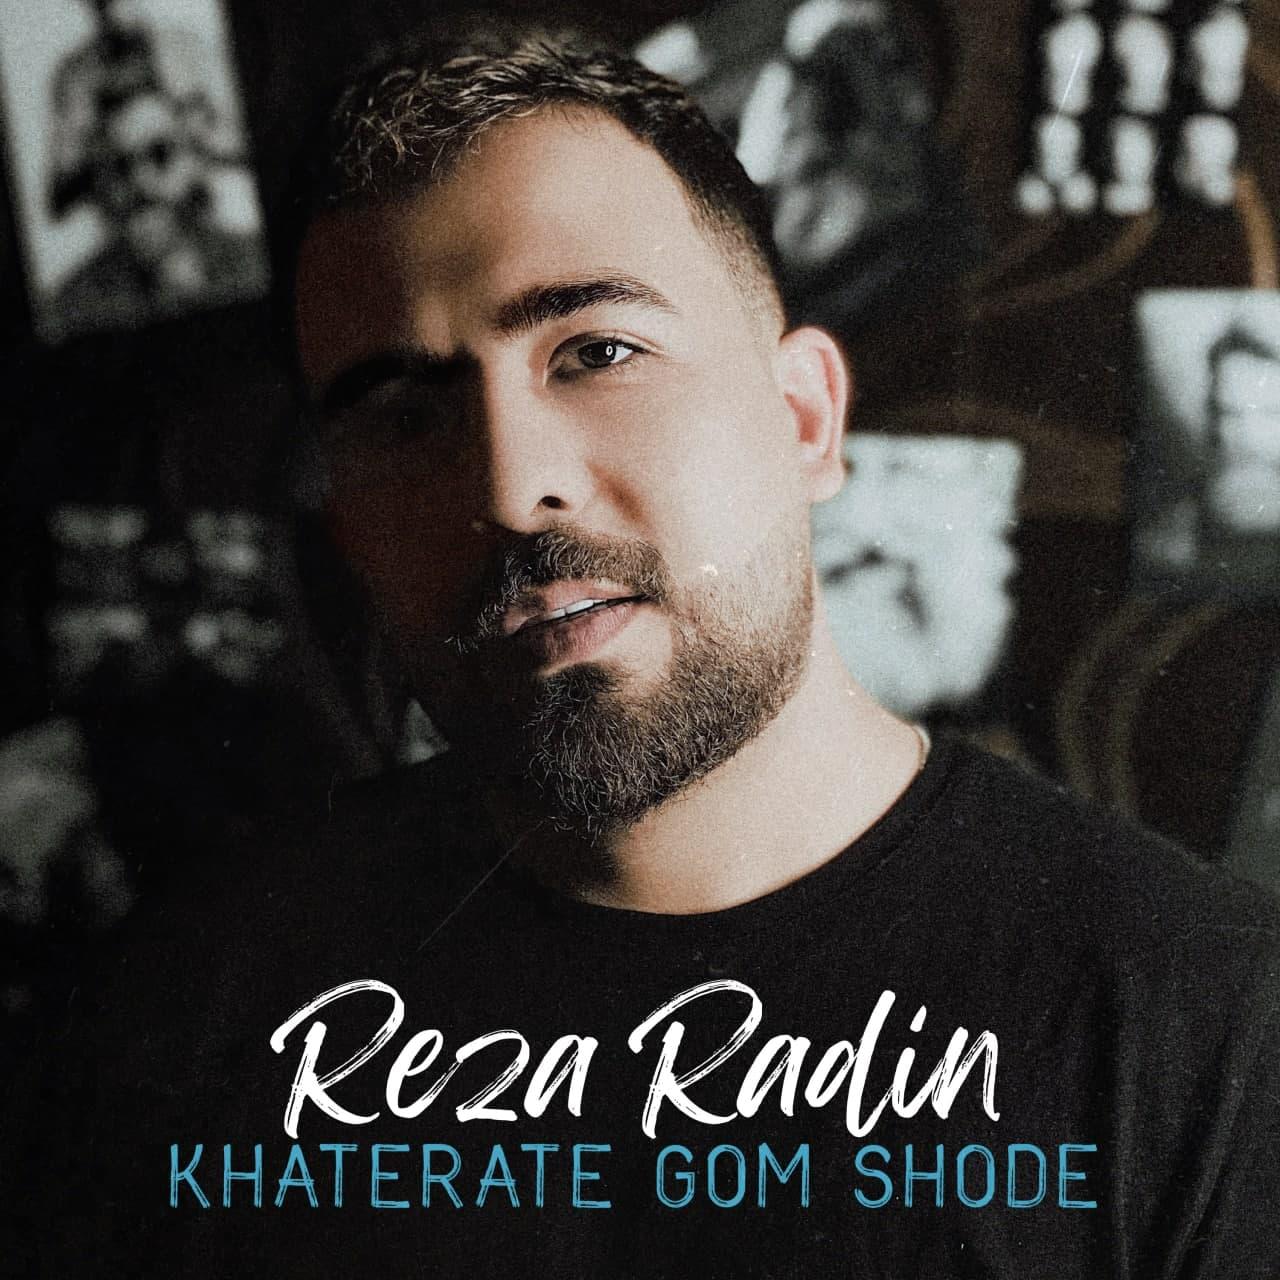 Reza Radin – Khaterate Gom Shode